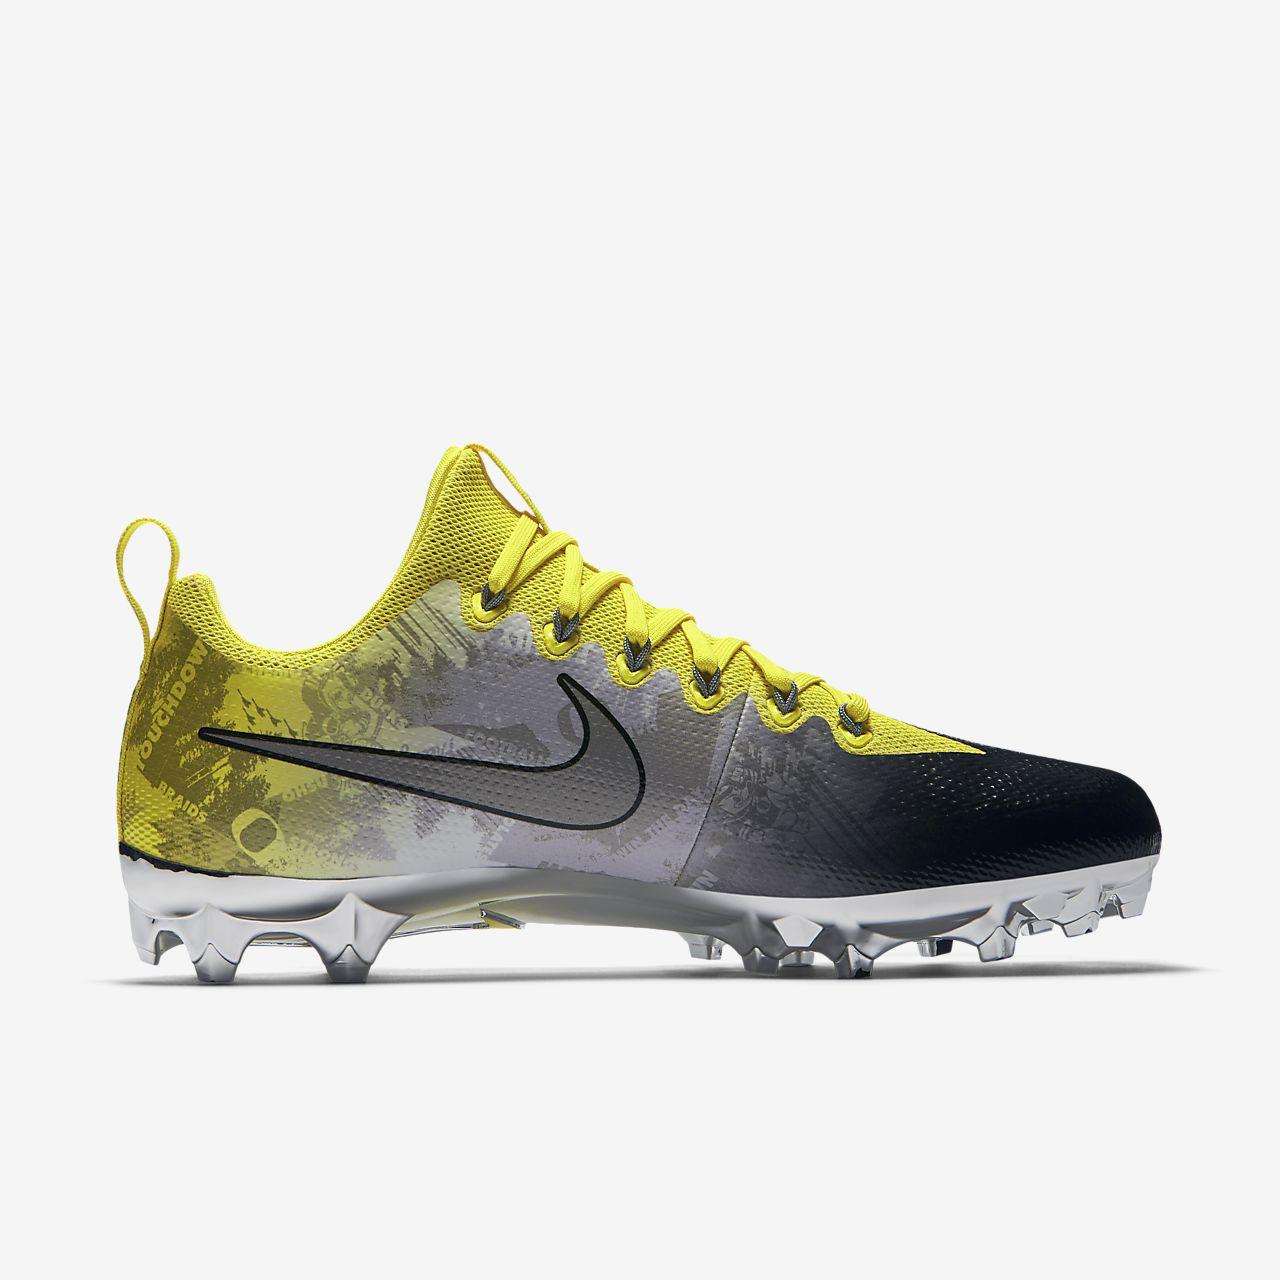 ... Nike Vapor Untouchable Pro (Doernbecher Freestyle) Men\u0027s Football Cleat